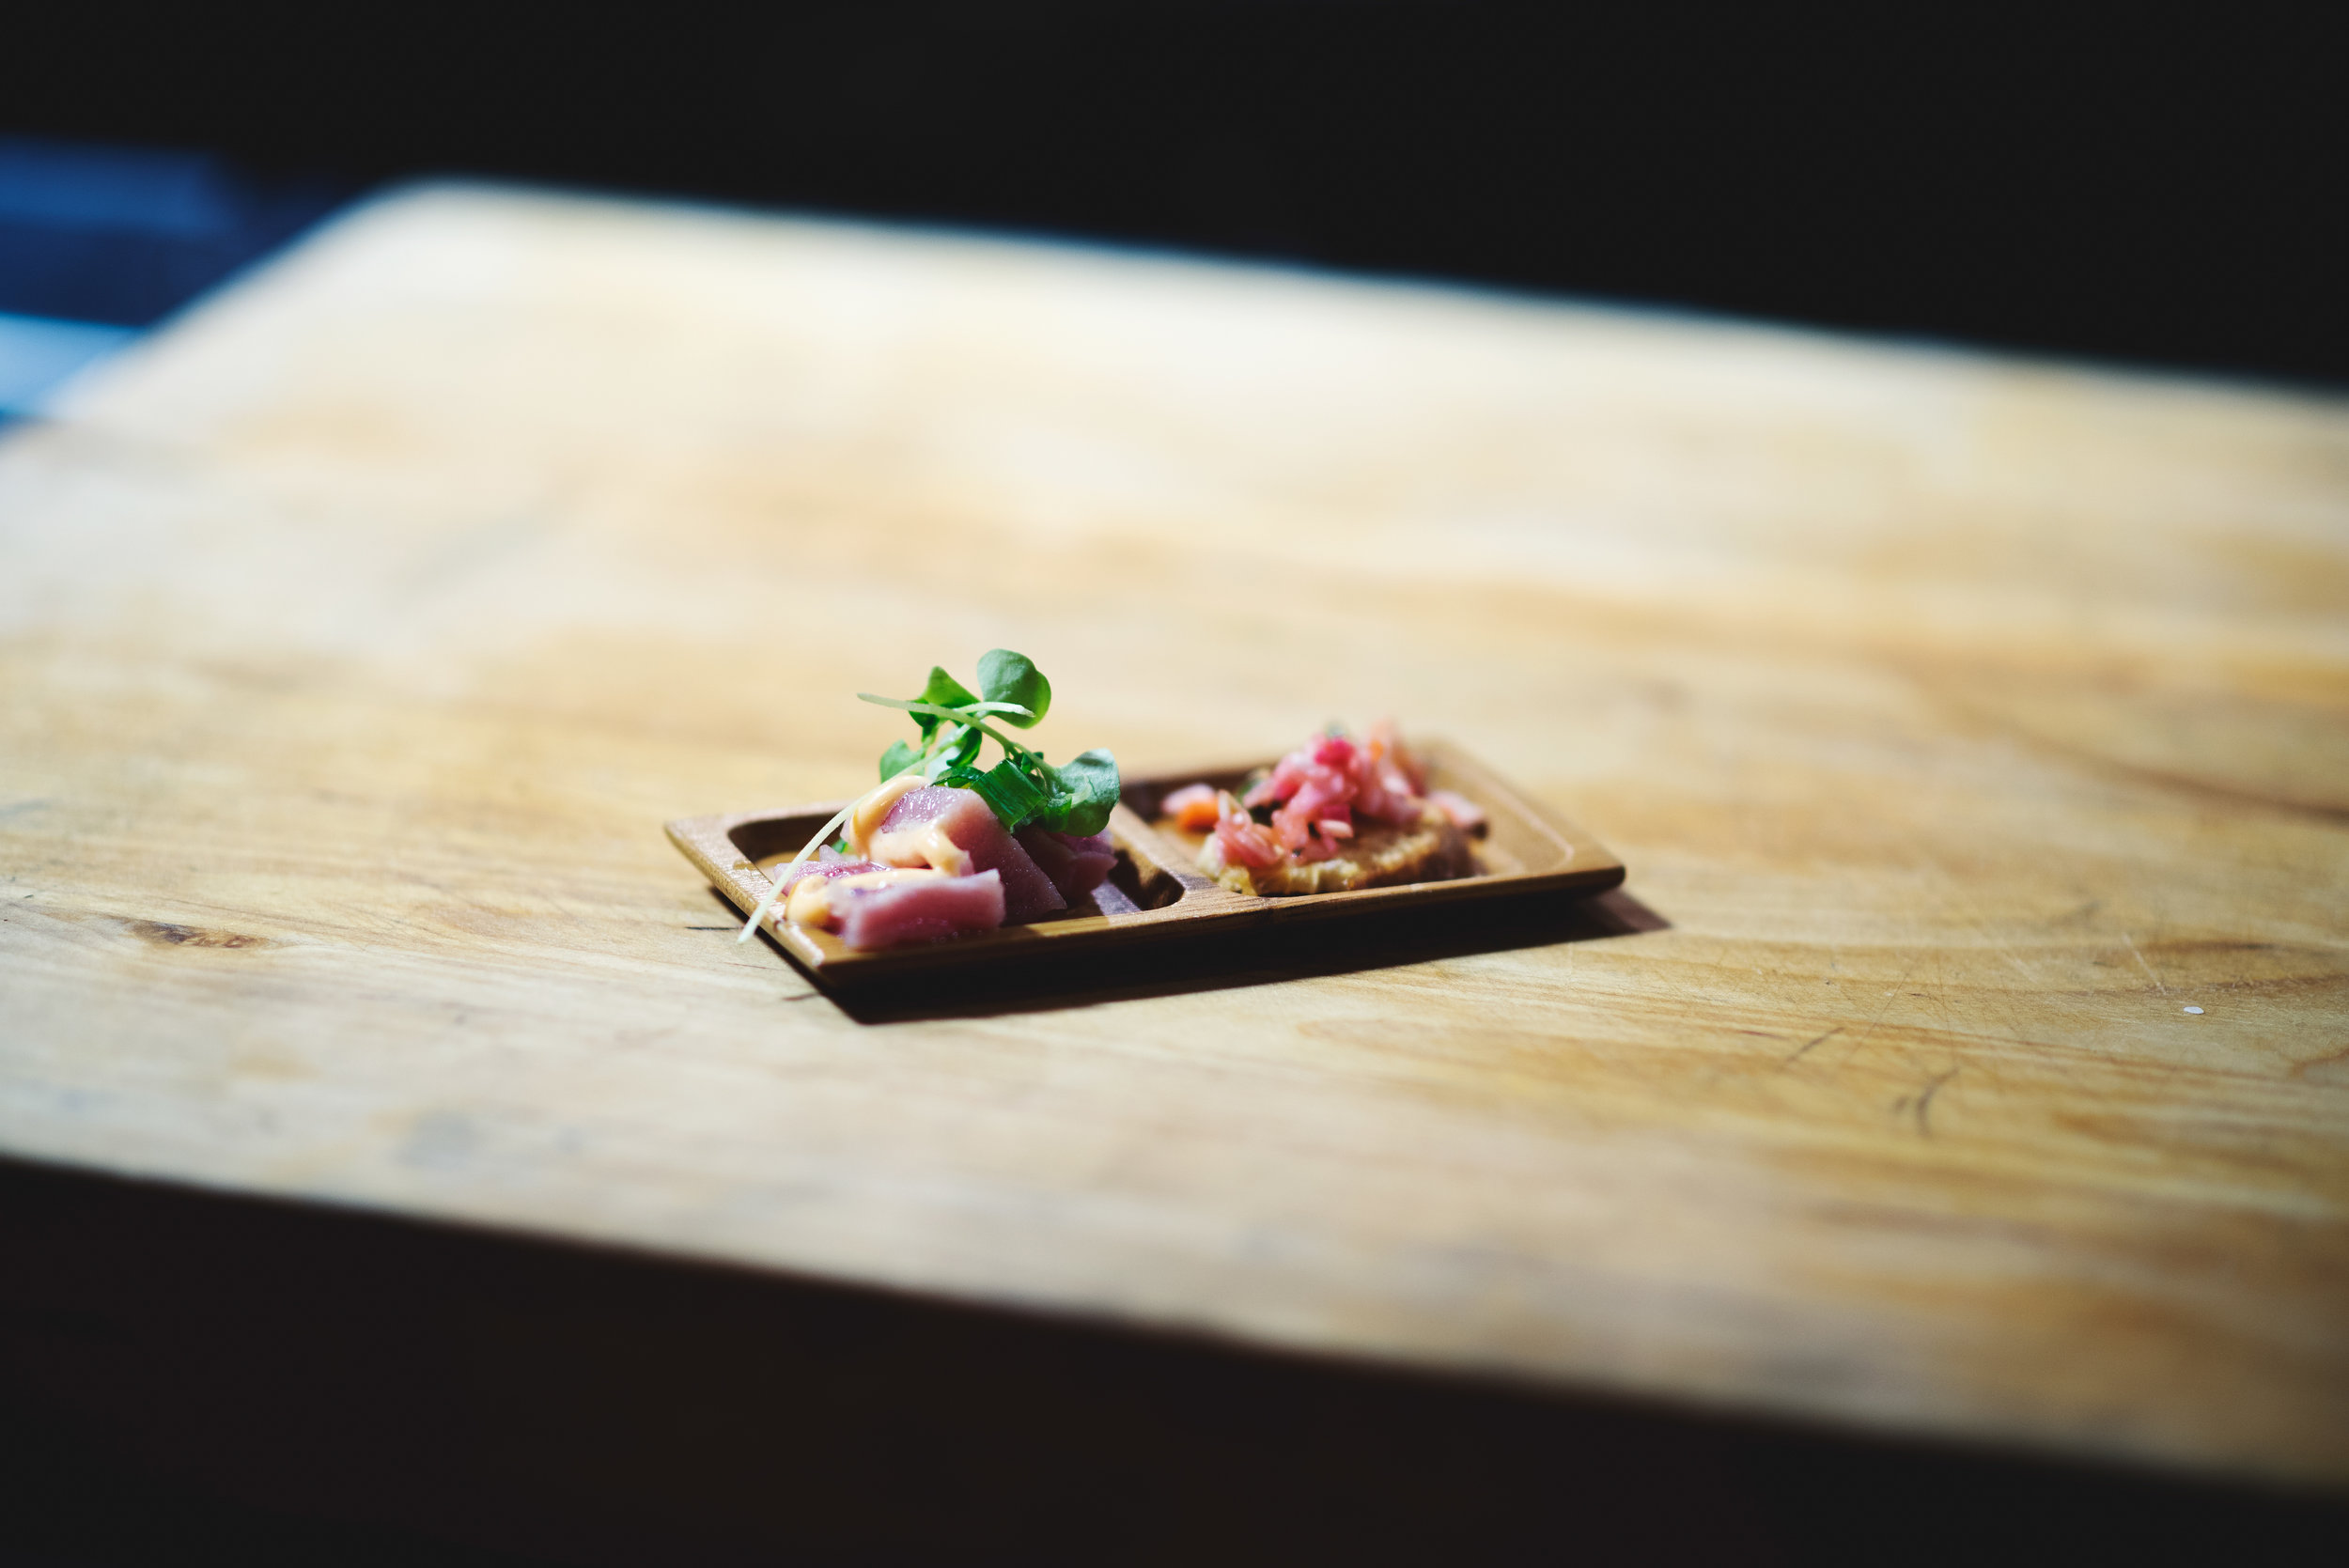 FoodFanaticsLive-Event-Food-Photography073.jpg